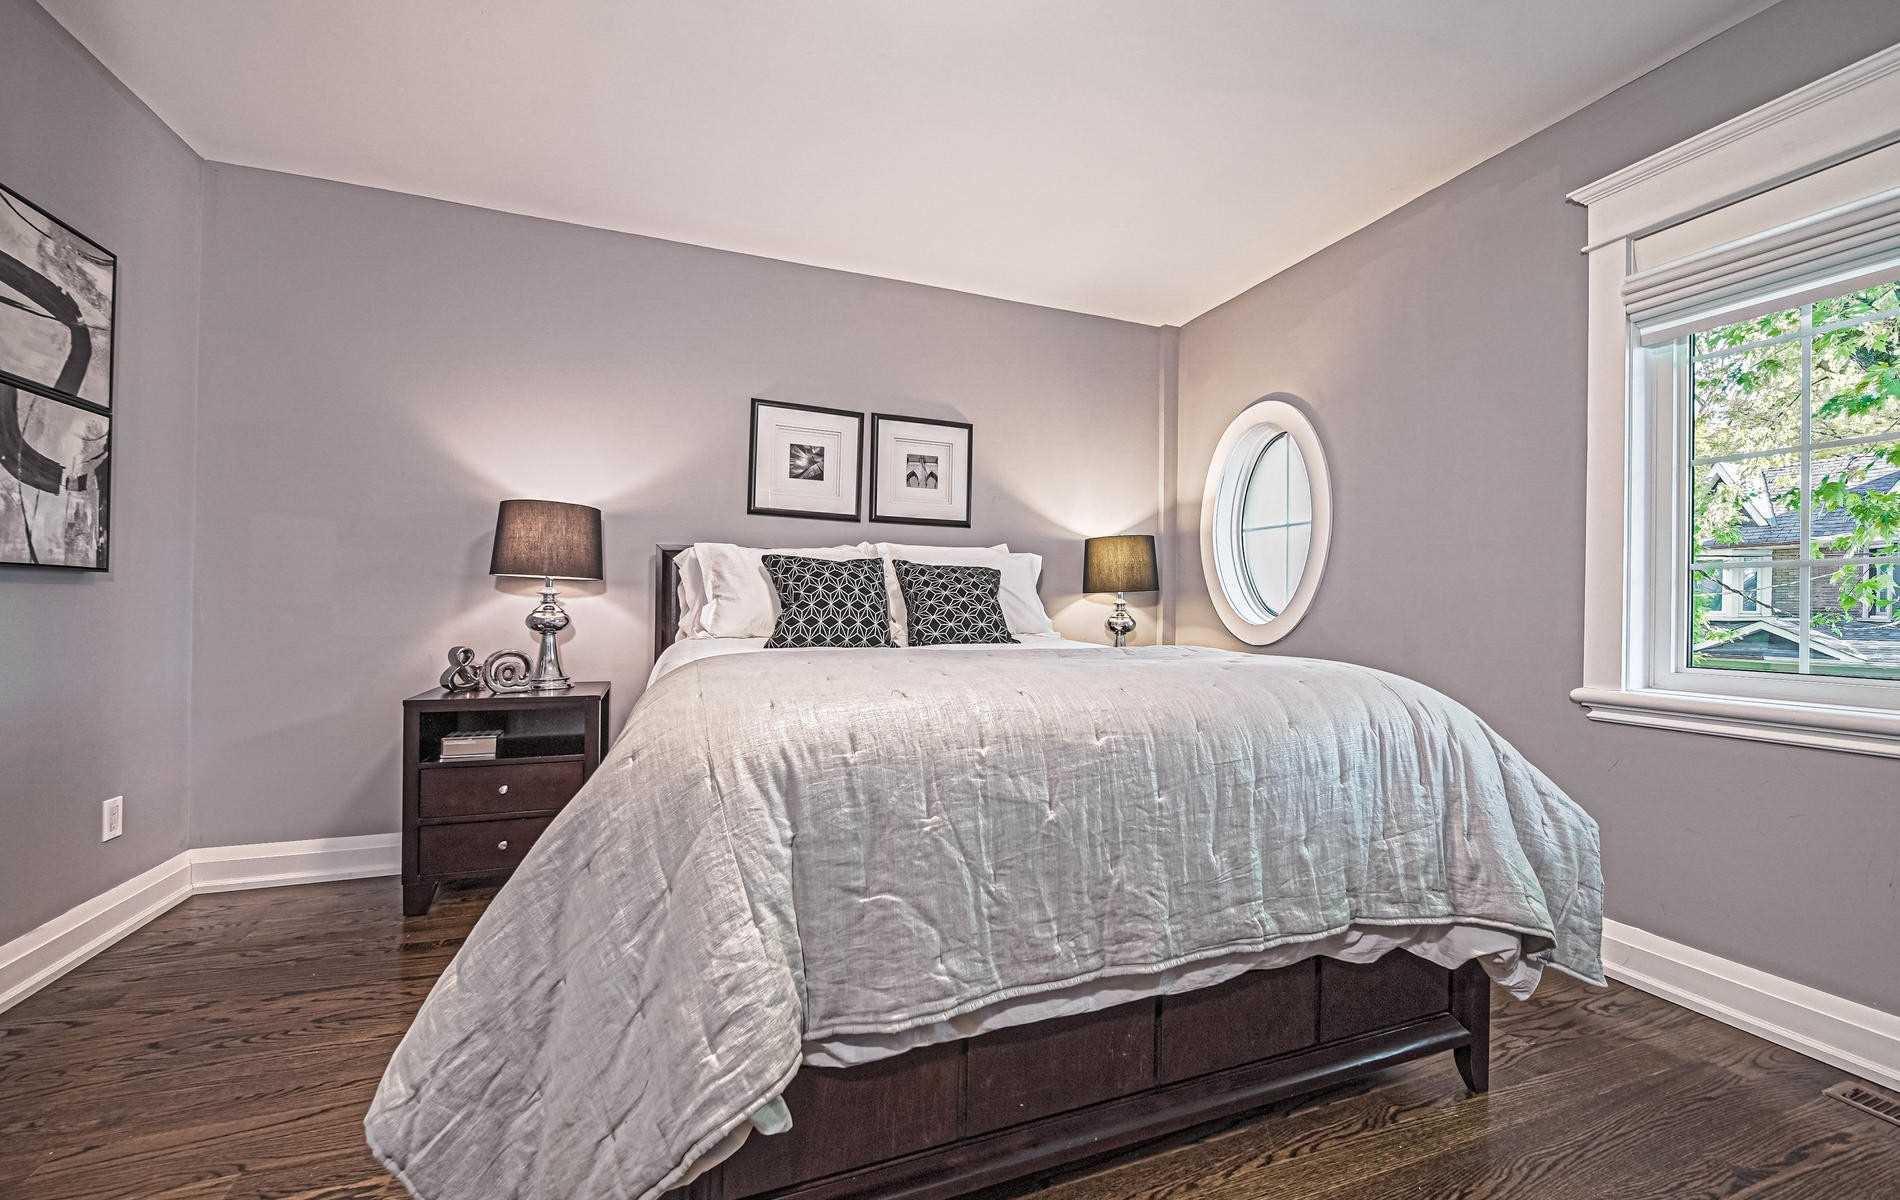 Photo 11: Photos: 216A Hamilton Street in Toronto: South Riverdale House (3-Storey) for sale (Toronto E01)  : MLS®# E4619870